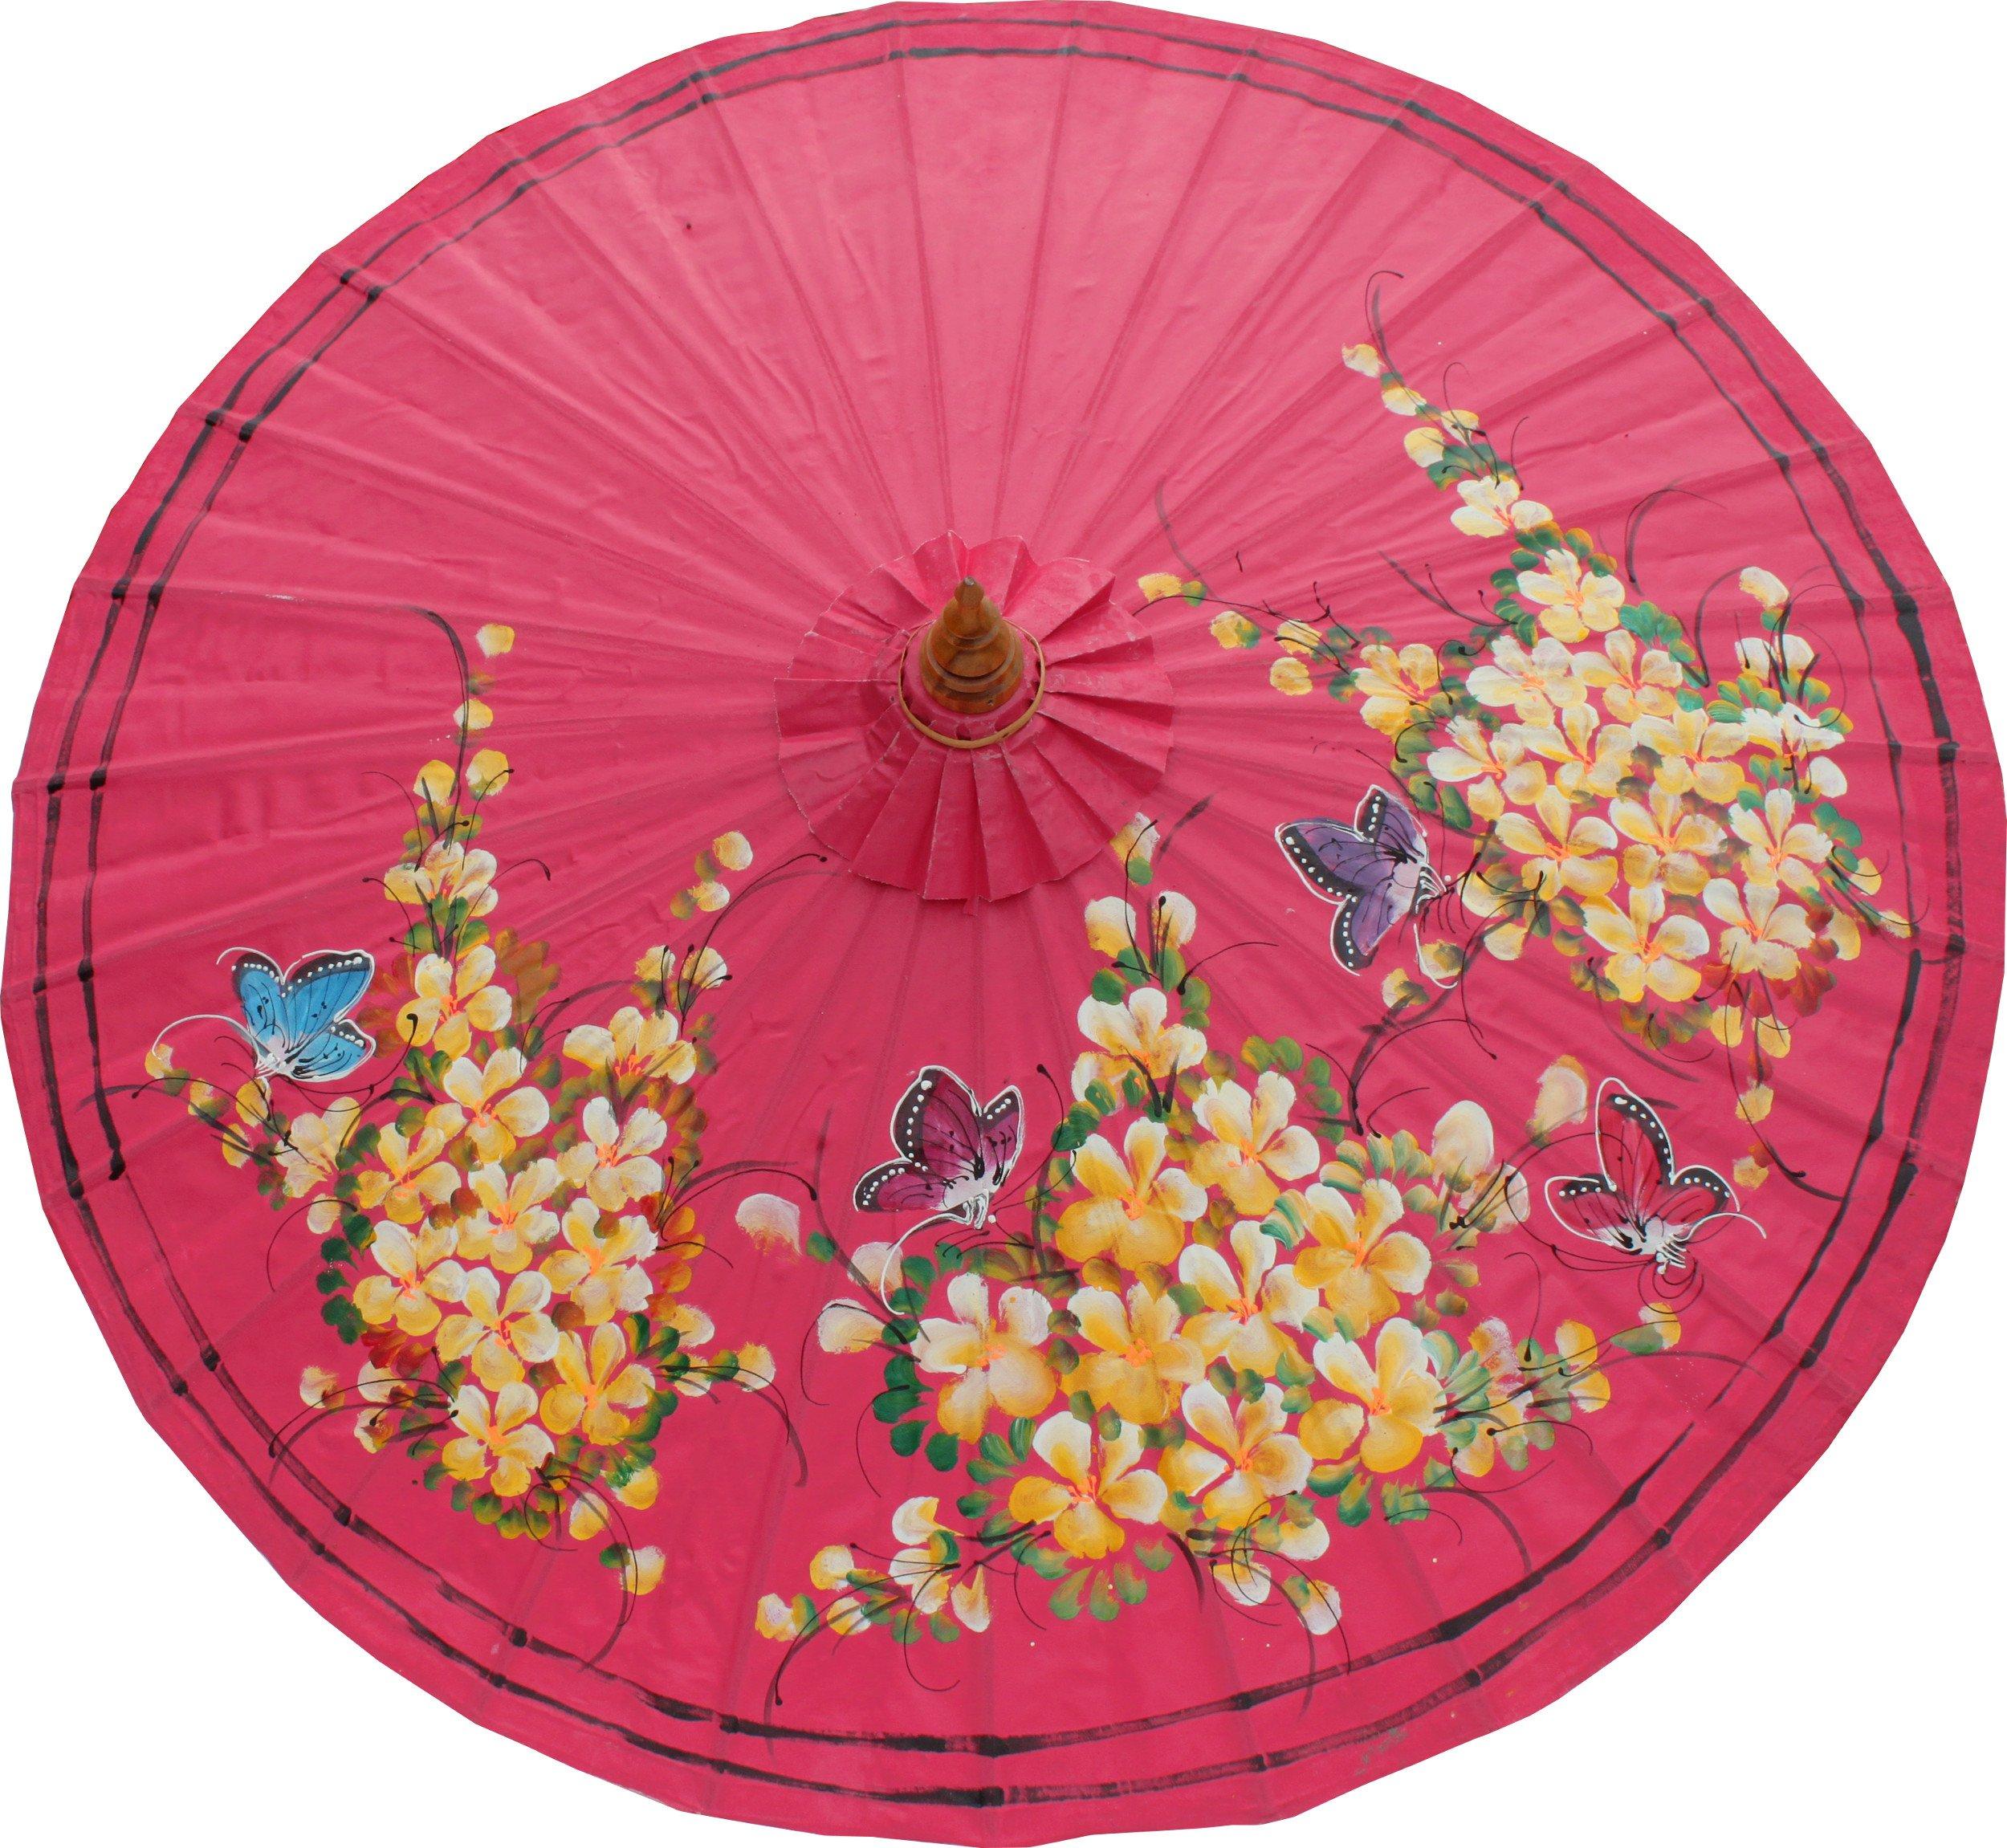 RaanPahMuang Thai Home Decoration Umbrella with Hand Painted Thailand Flower Art, (radius when open) 17 inch, Pink artwork #A